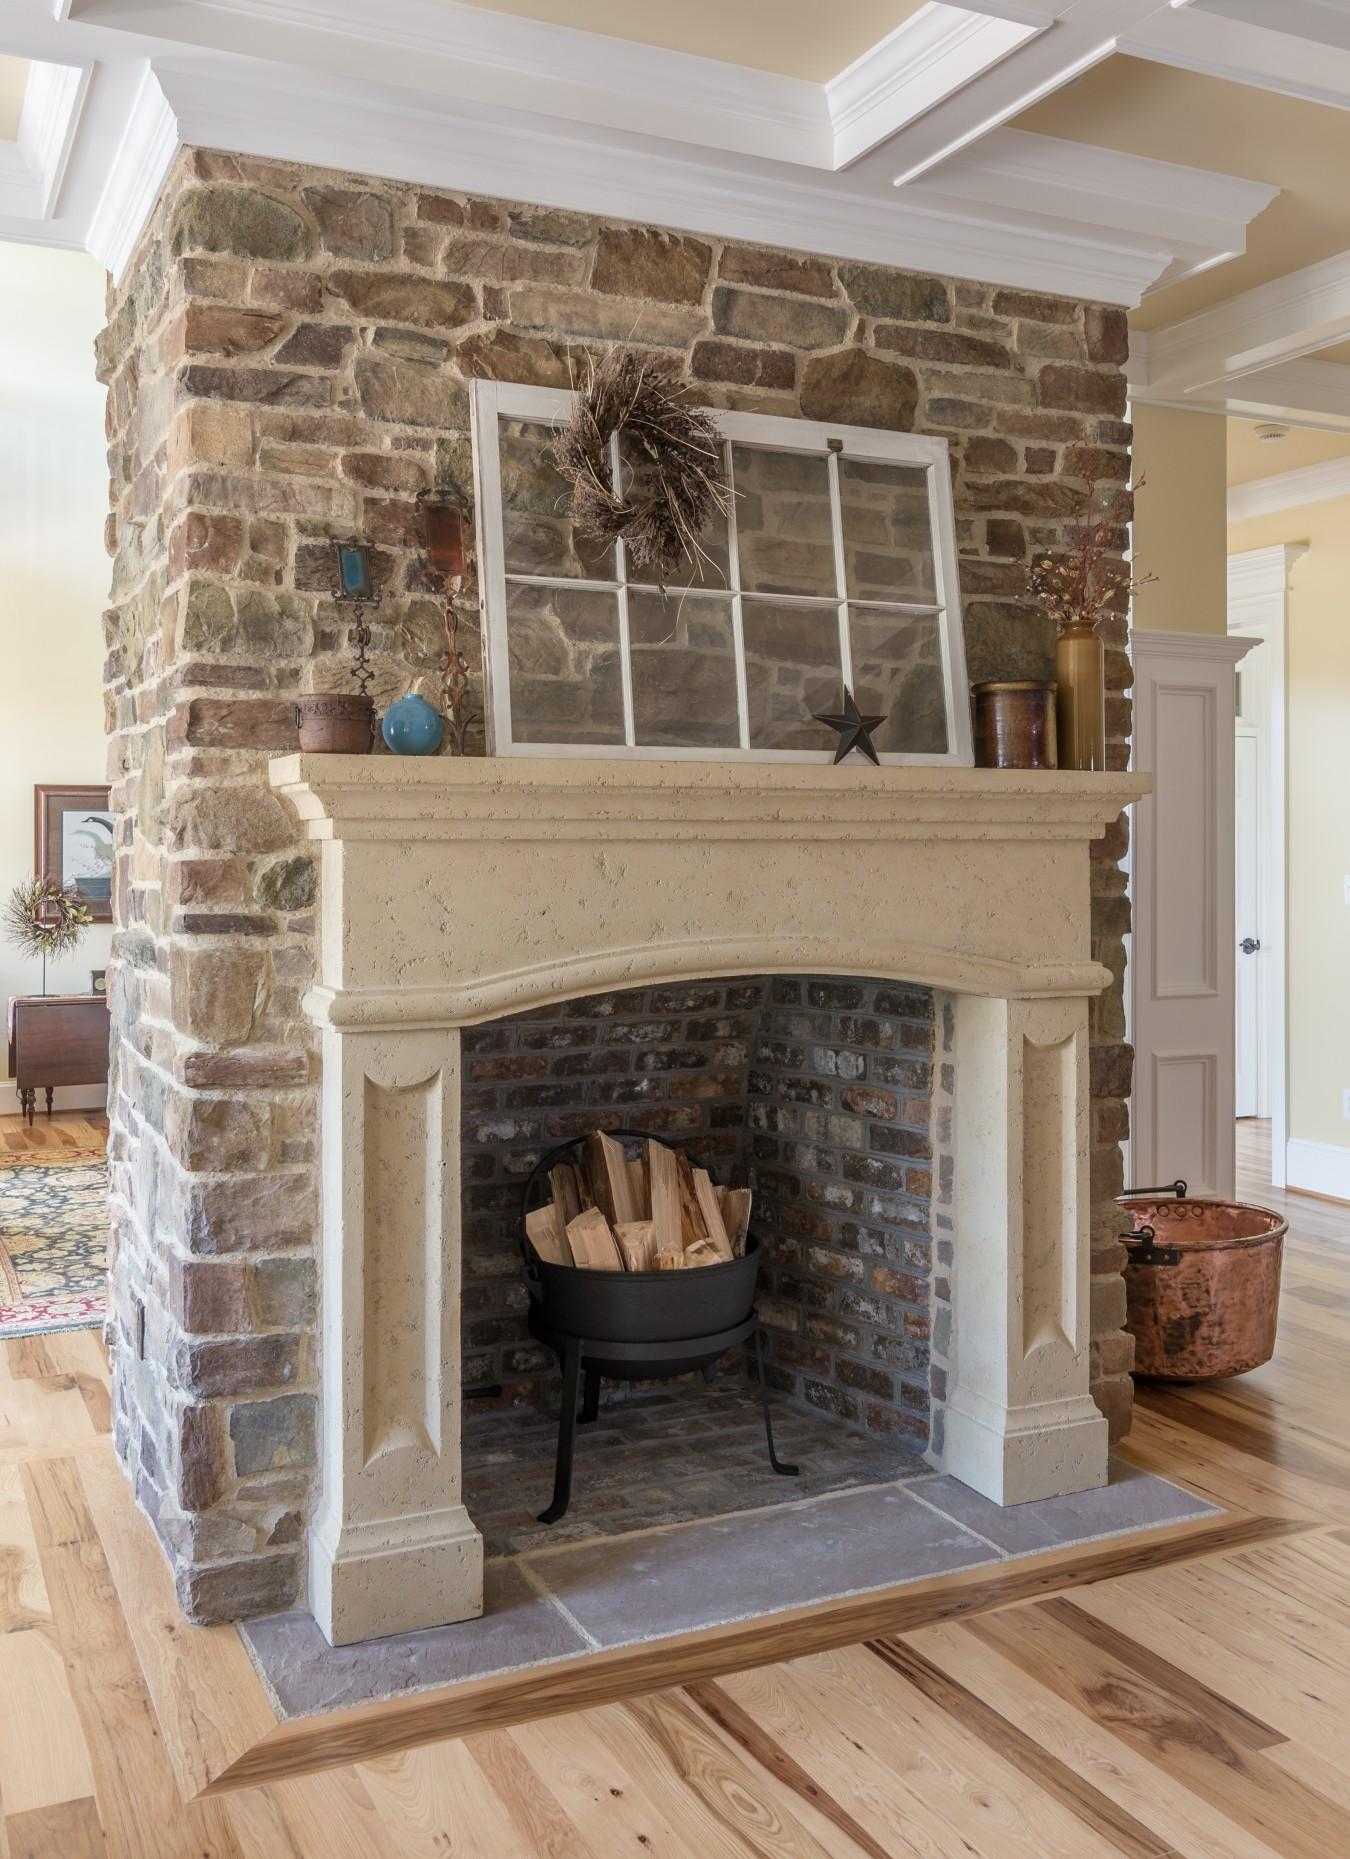 Decorative Stone Cladding Designed To Add Some Extra Style